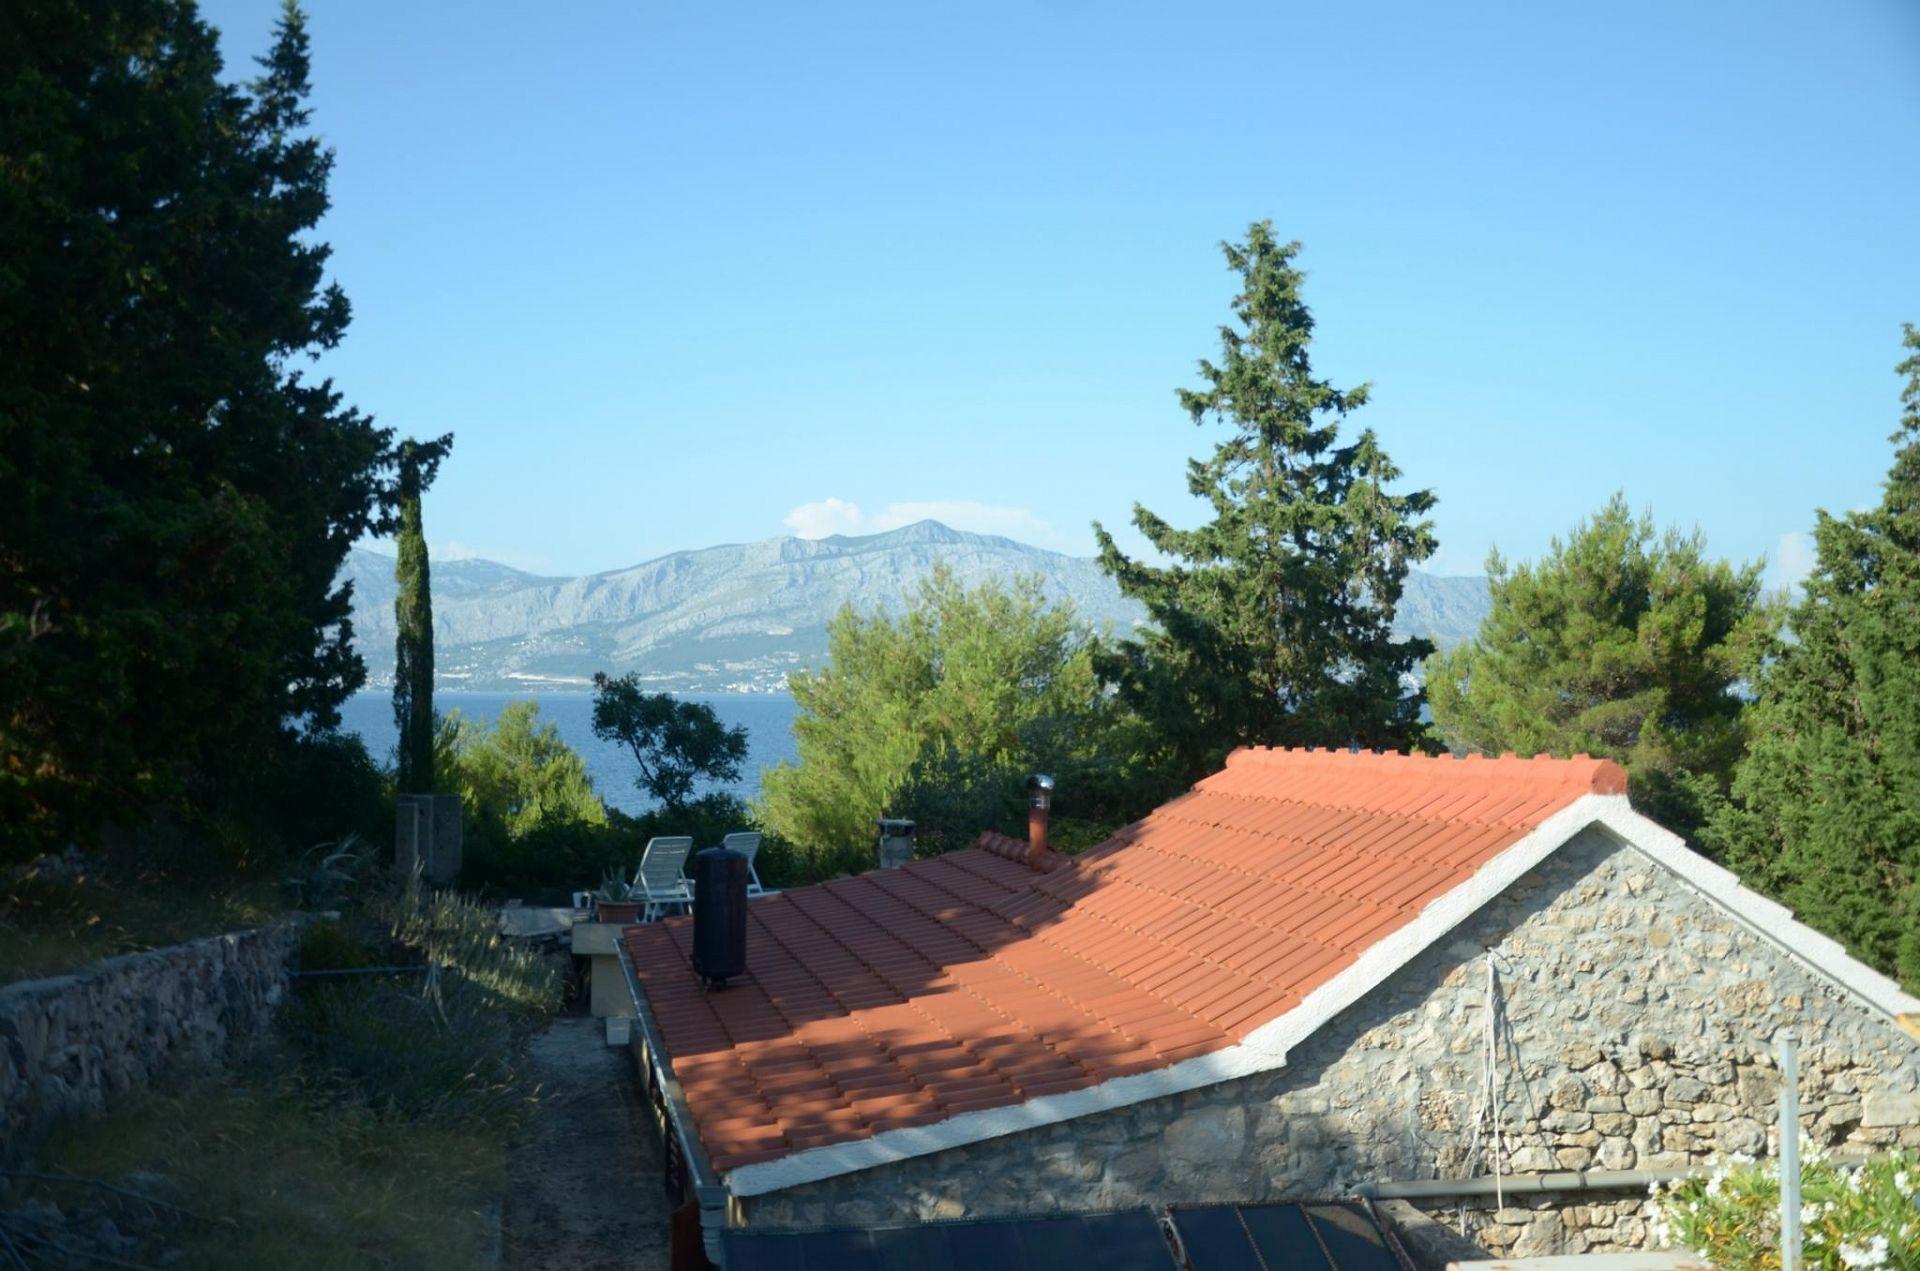 3188 - Bucht Vela Lozna (Postira) - Ferienhäuser, Villen Kroatien